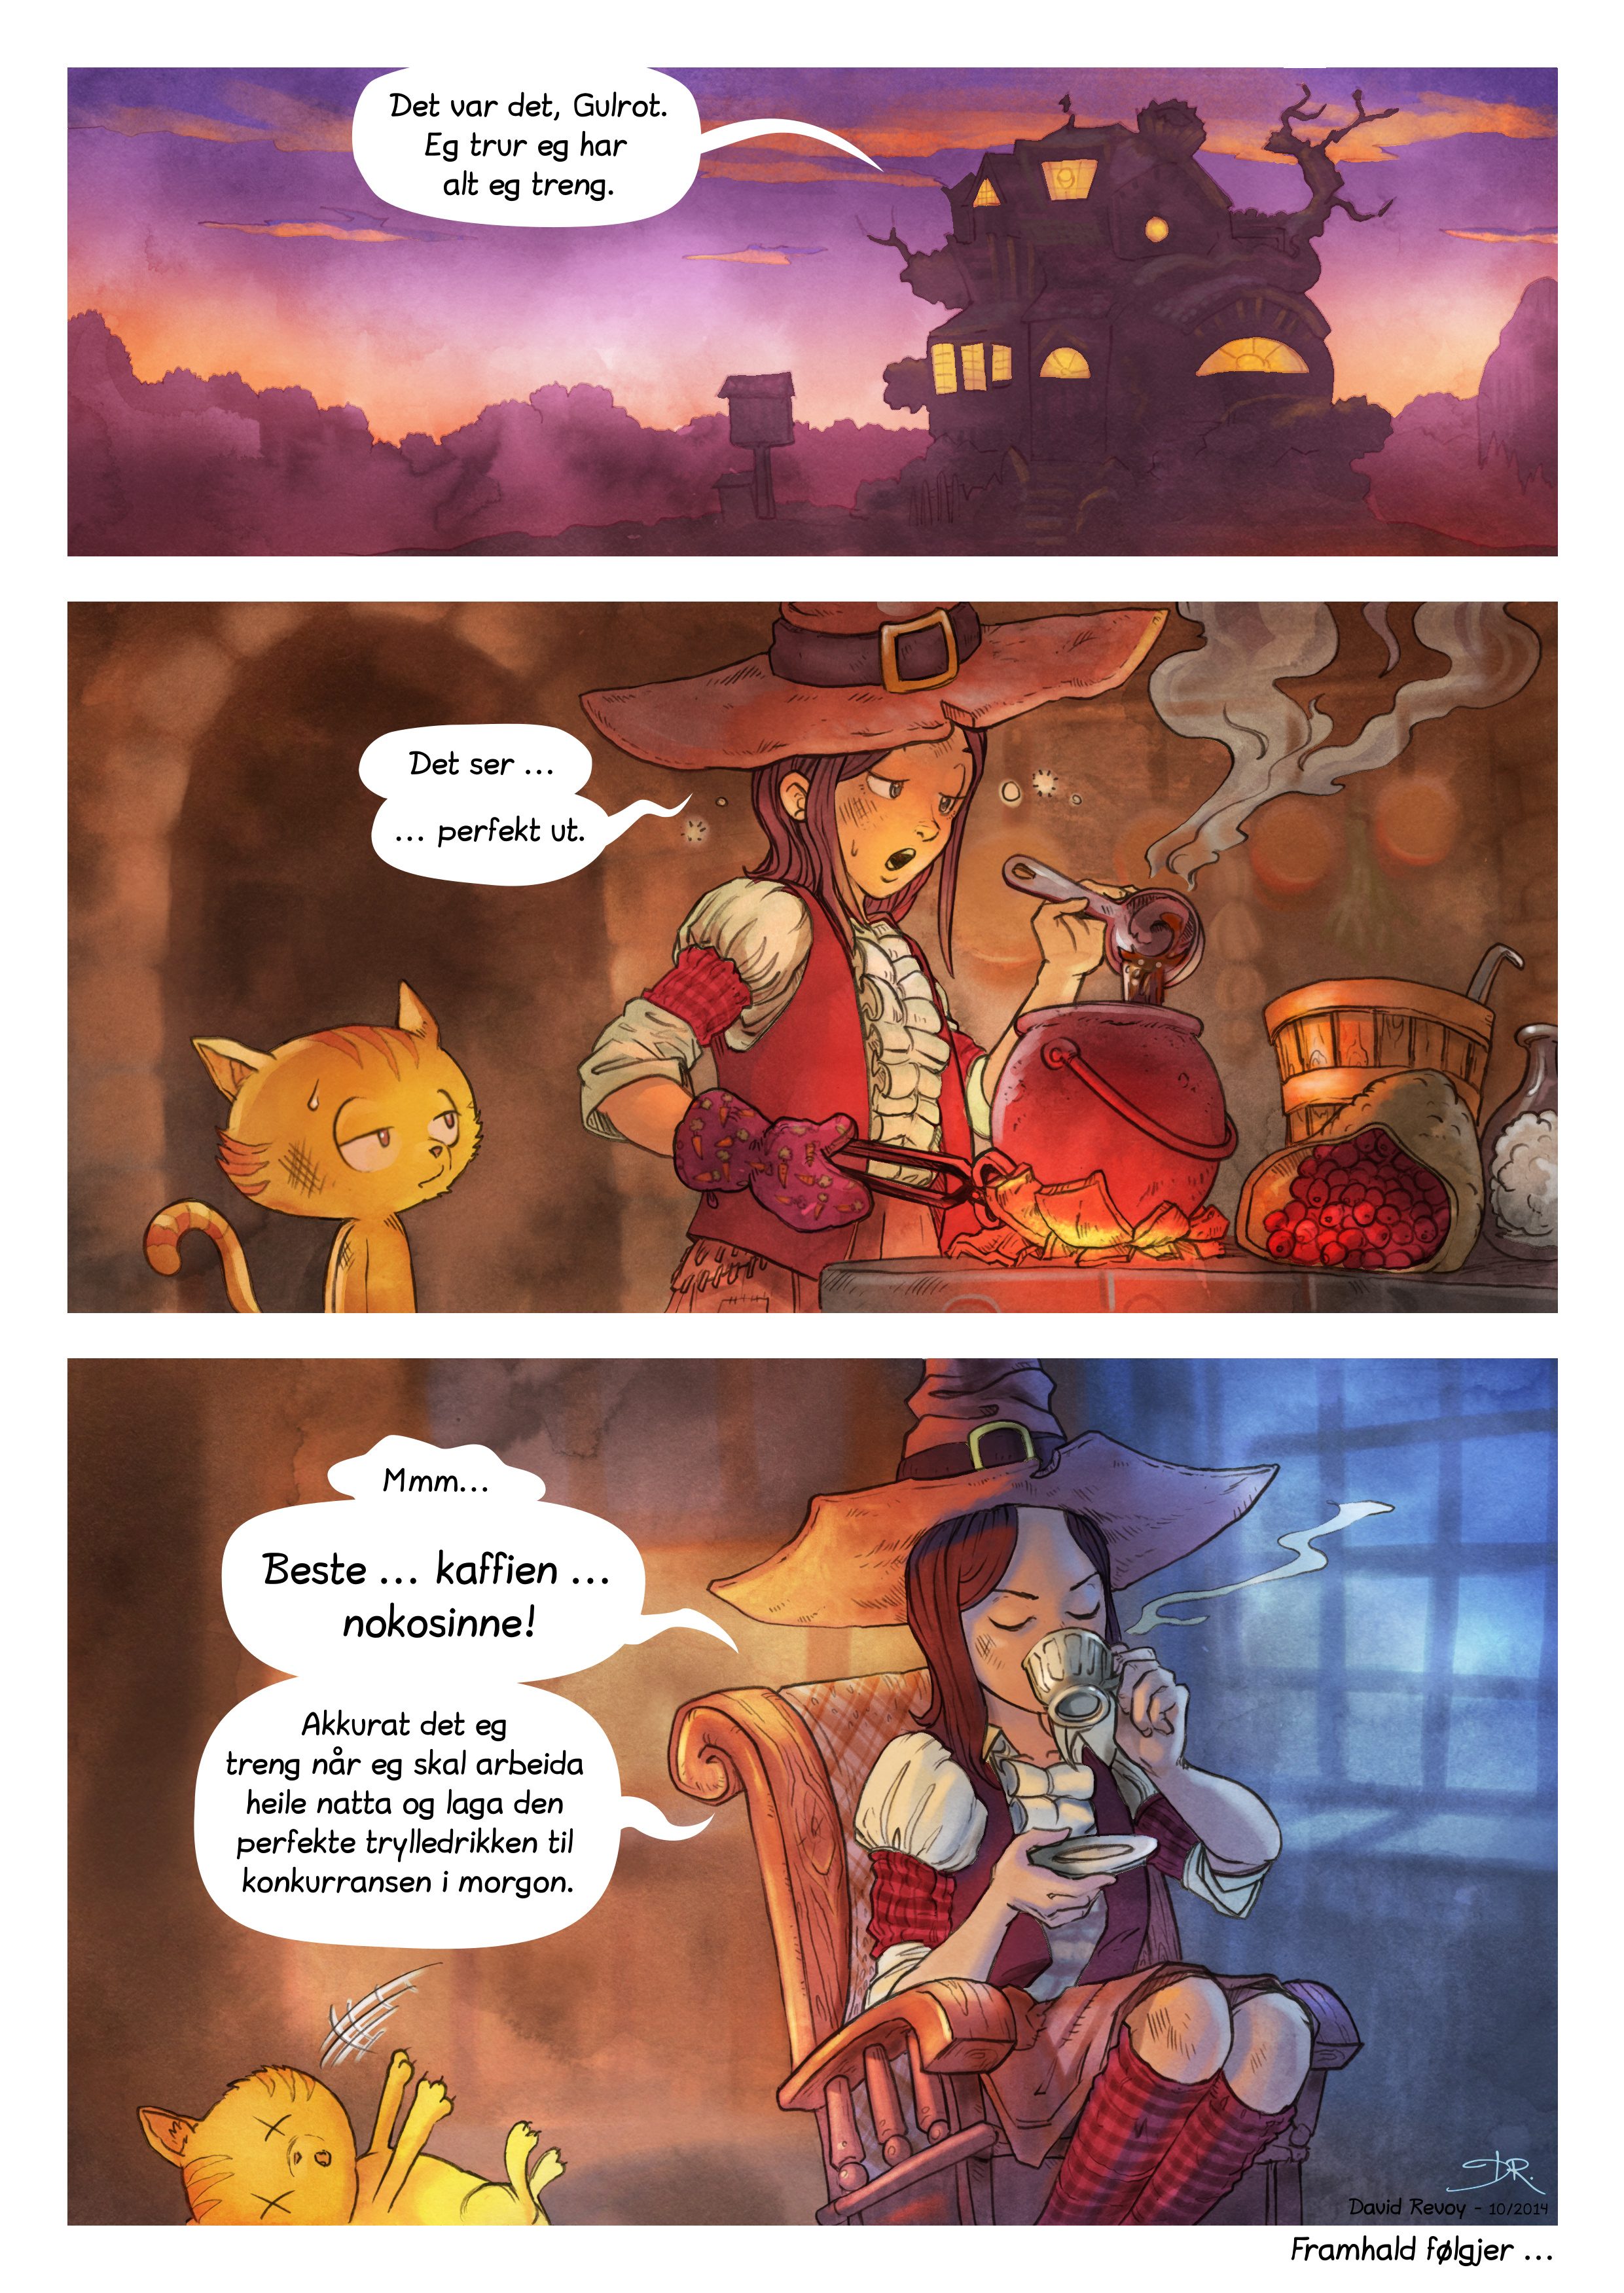 Episode 3: Dei hemmelege ingrediensane, Side 7